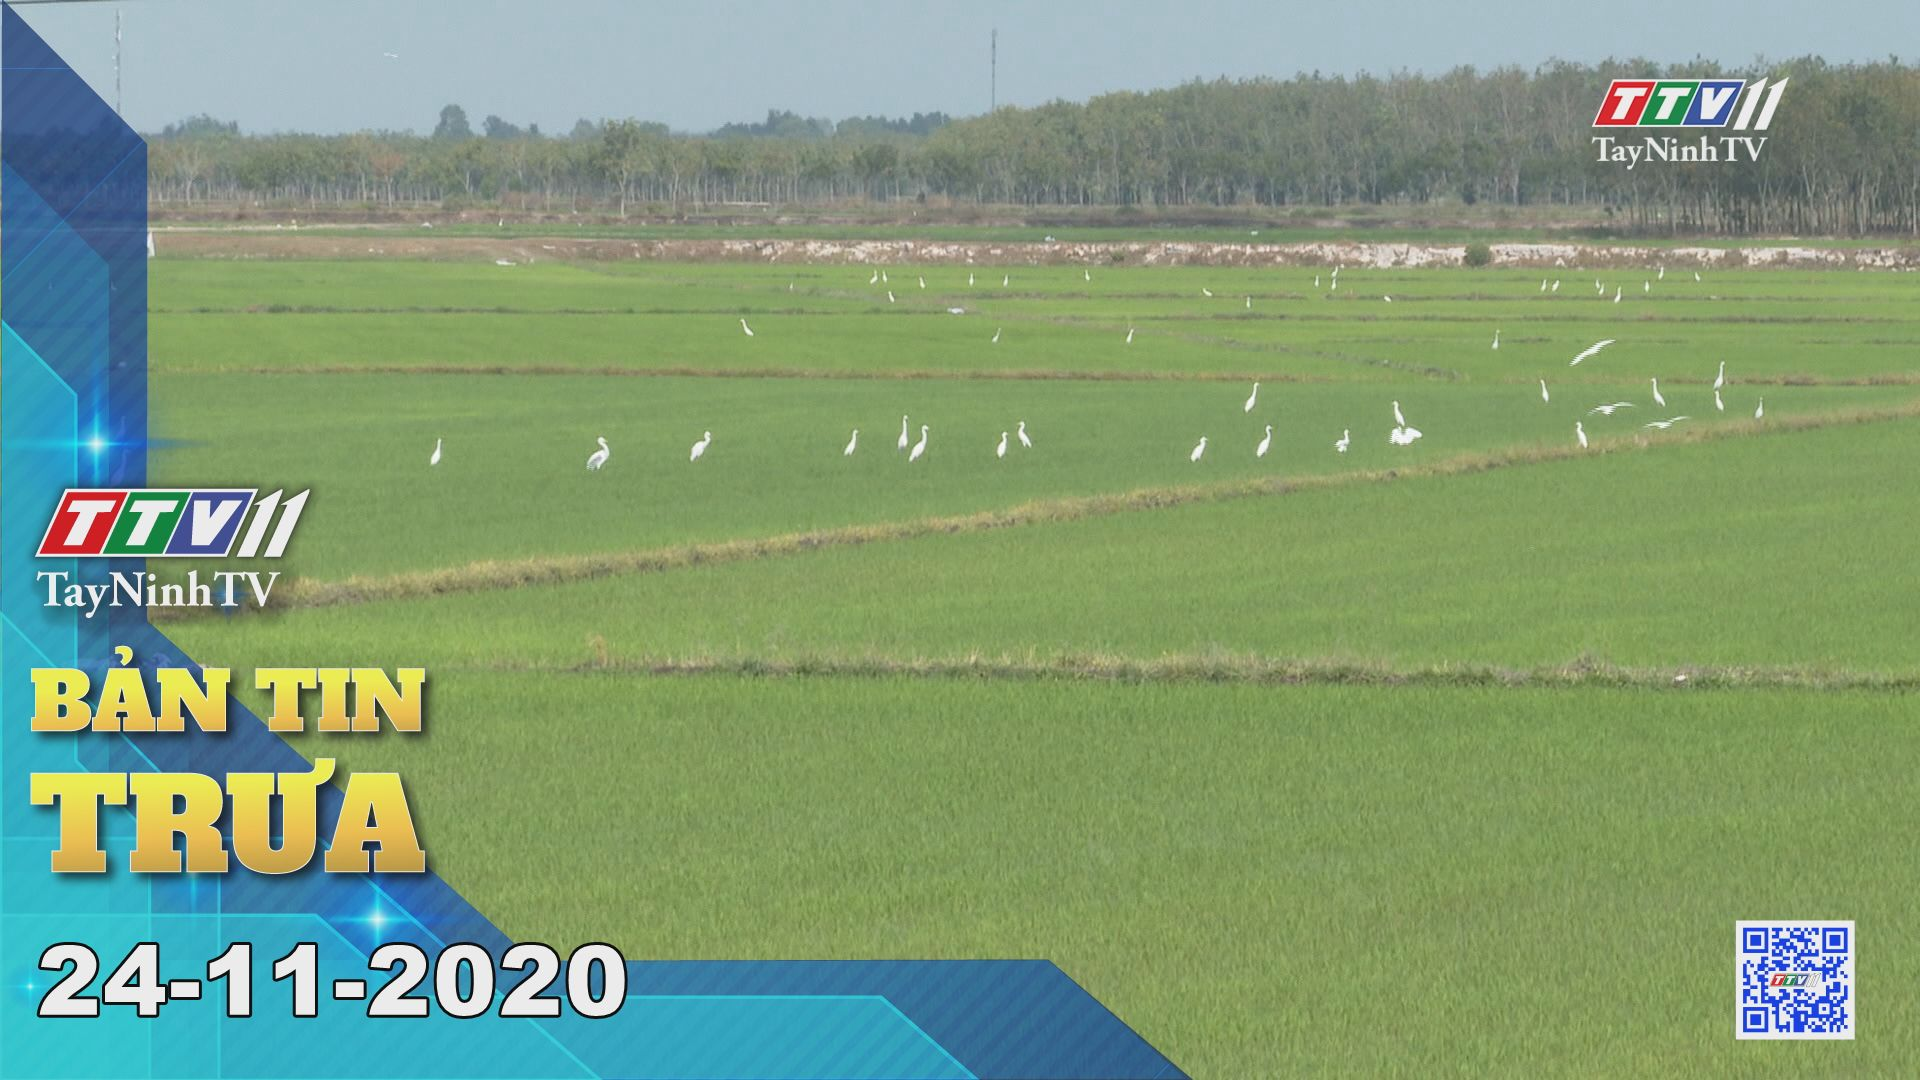 Bản tin trưa 24-11-2020 | Tin tức hôm nay | TayNinhTV